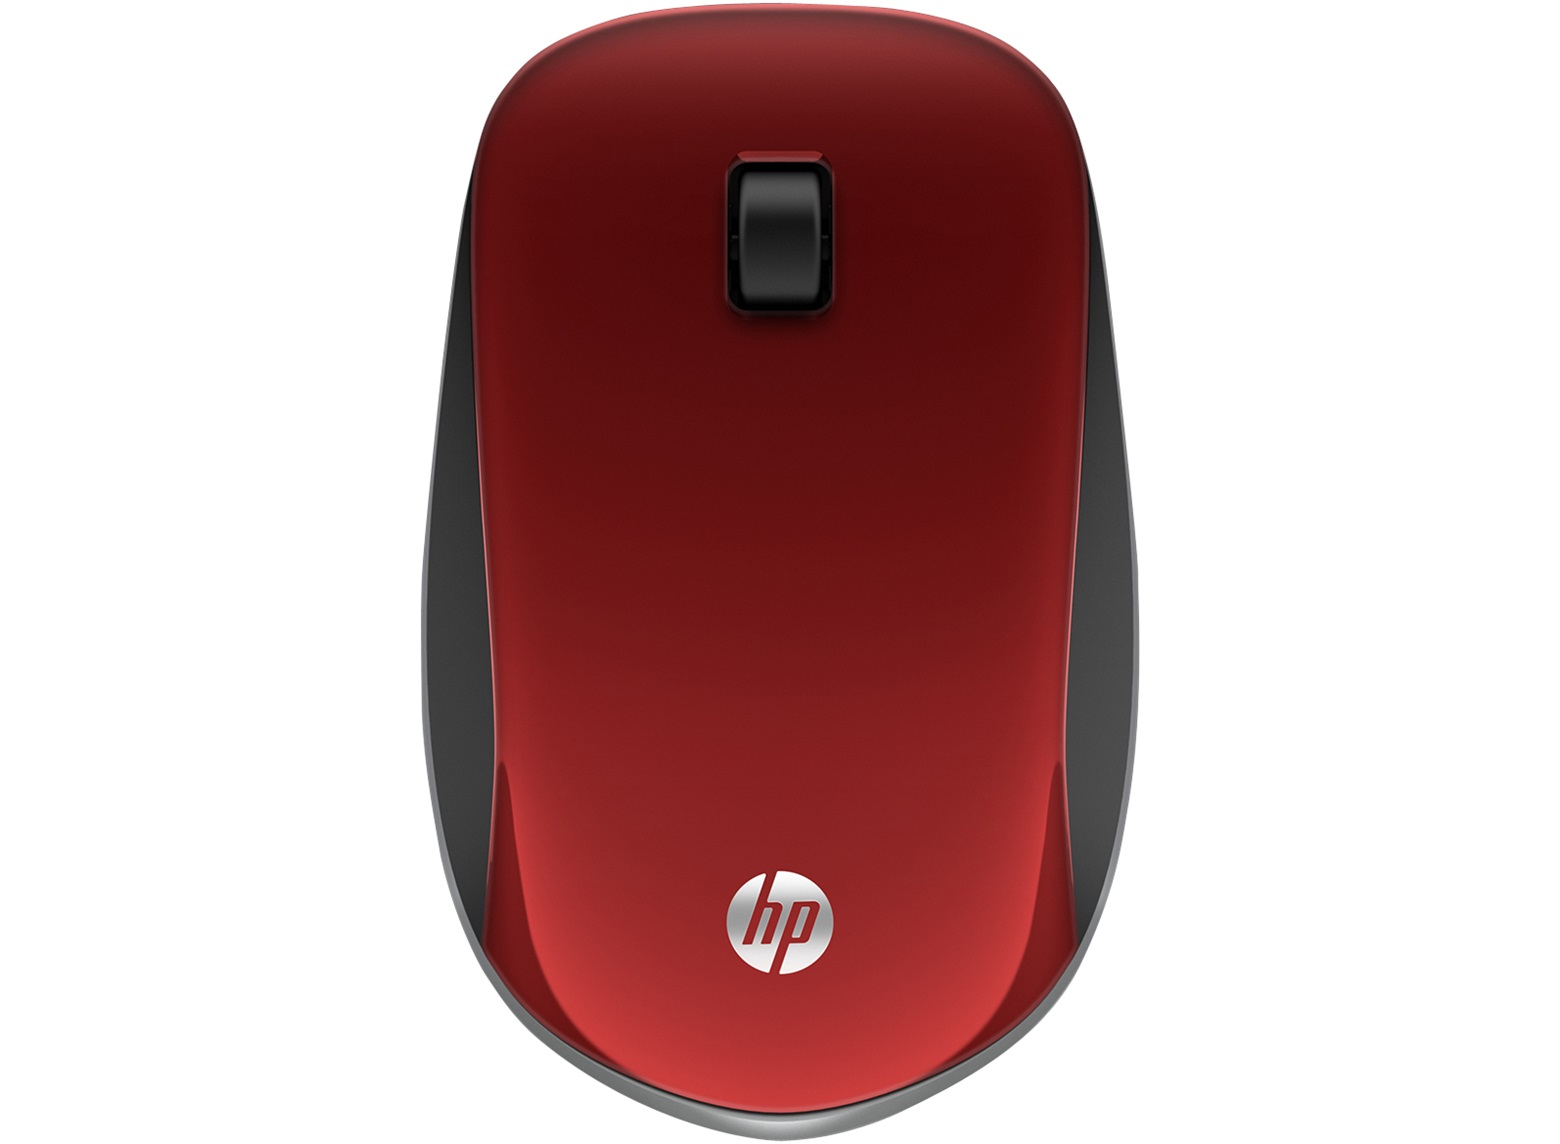 HP rode draadloze muis